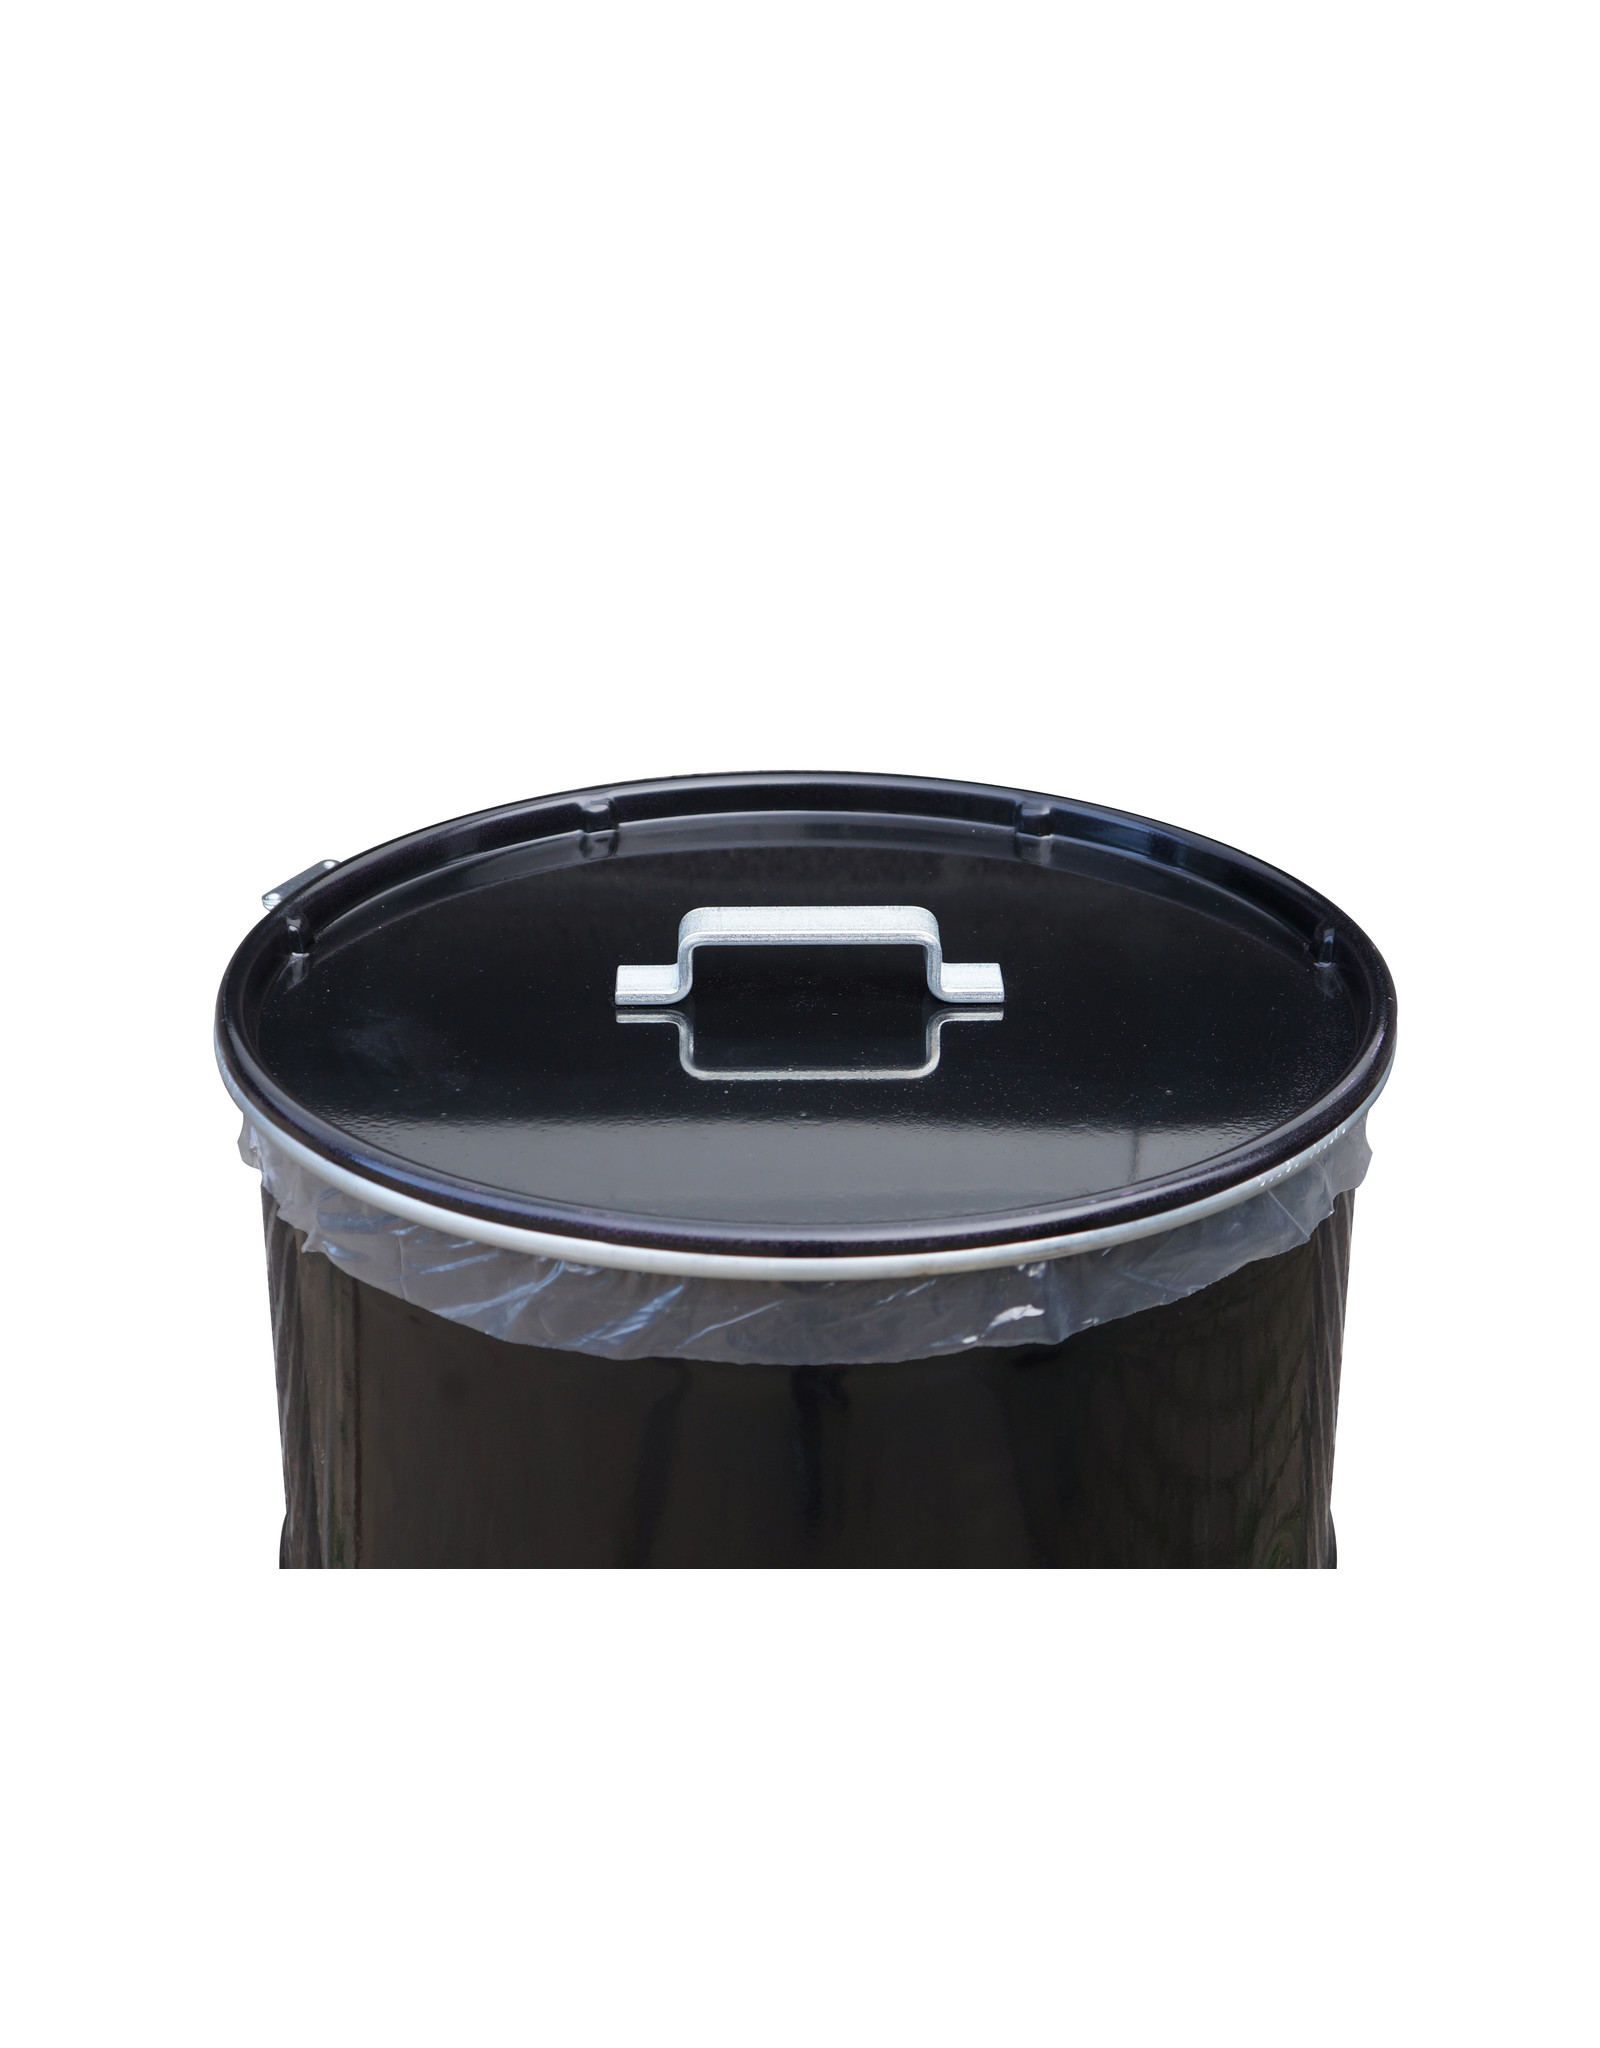 BinBin Mülleimer 120 Liter